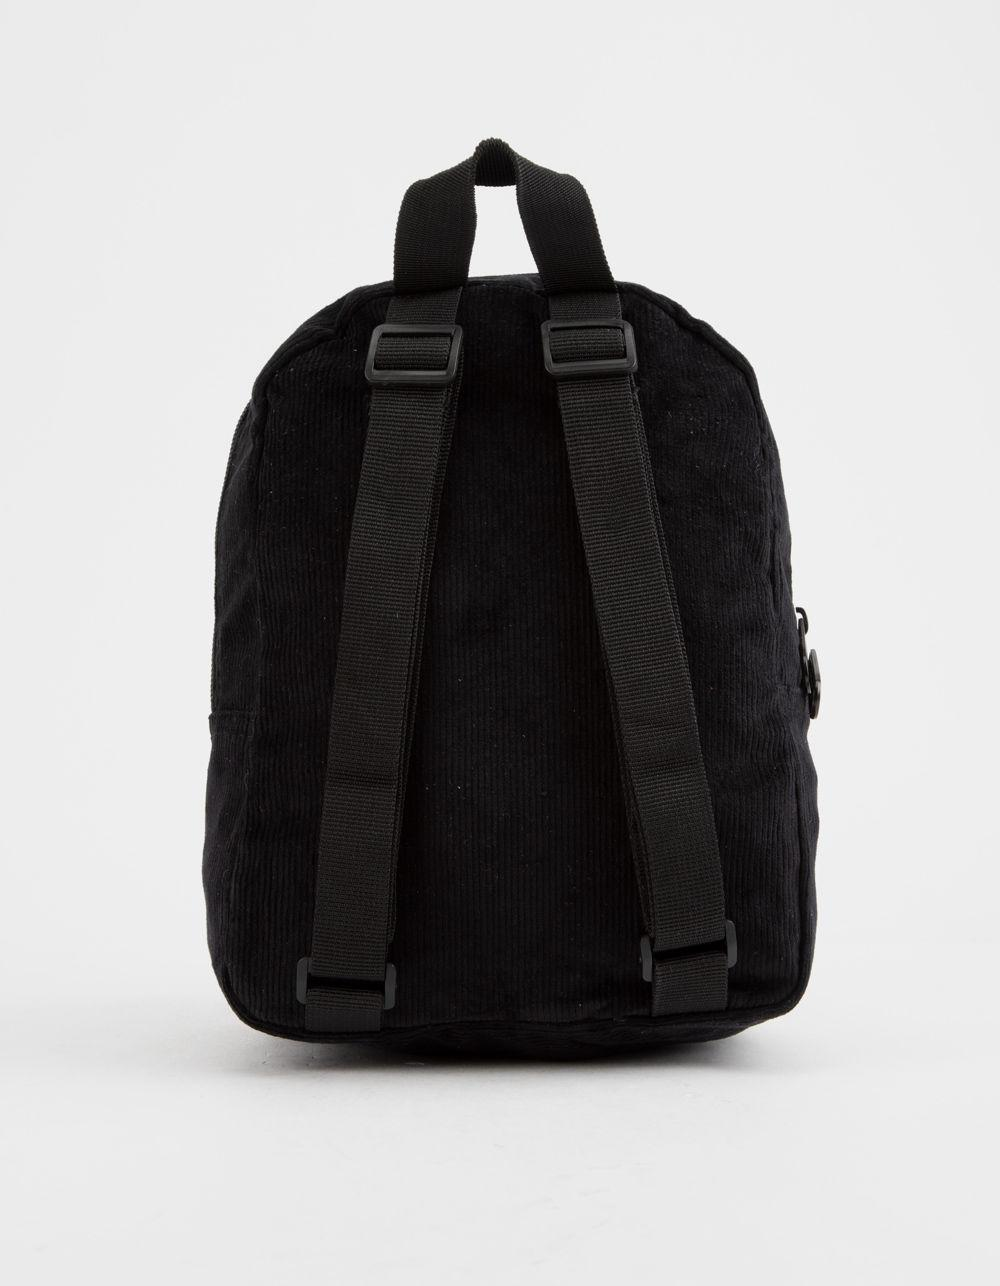 88eaeea57 Cute Mini Backpacks Tillys | The Shred Centre